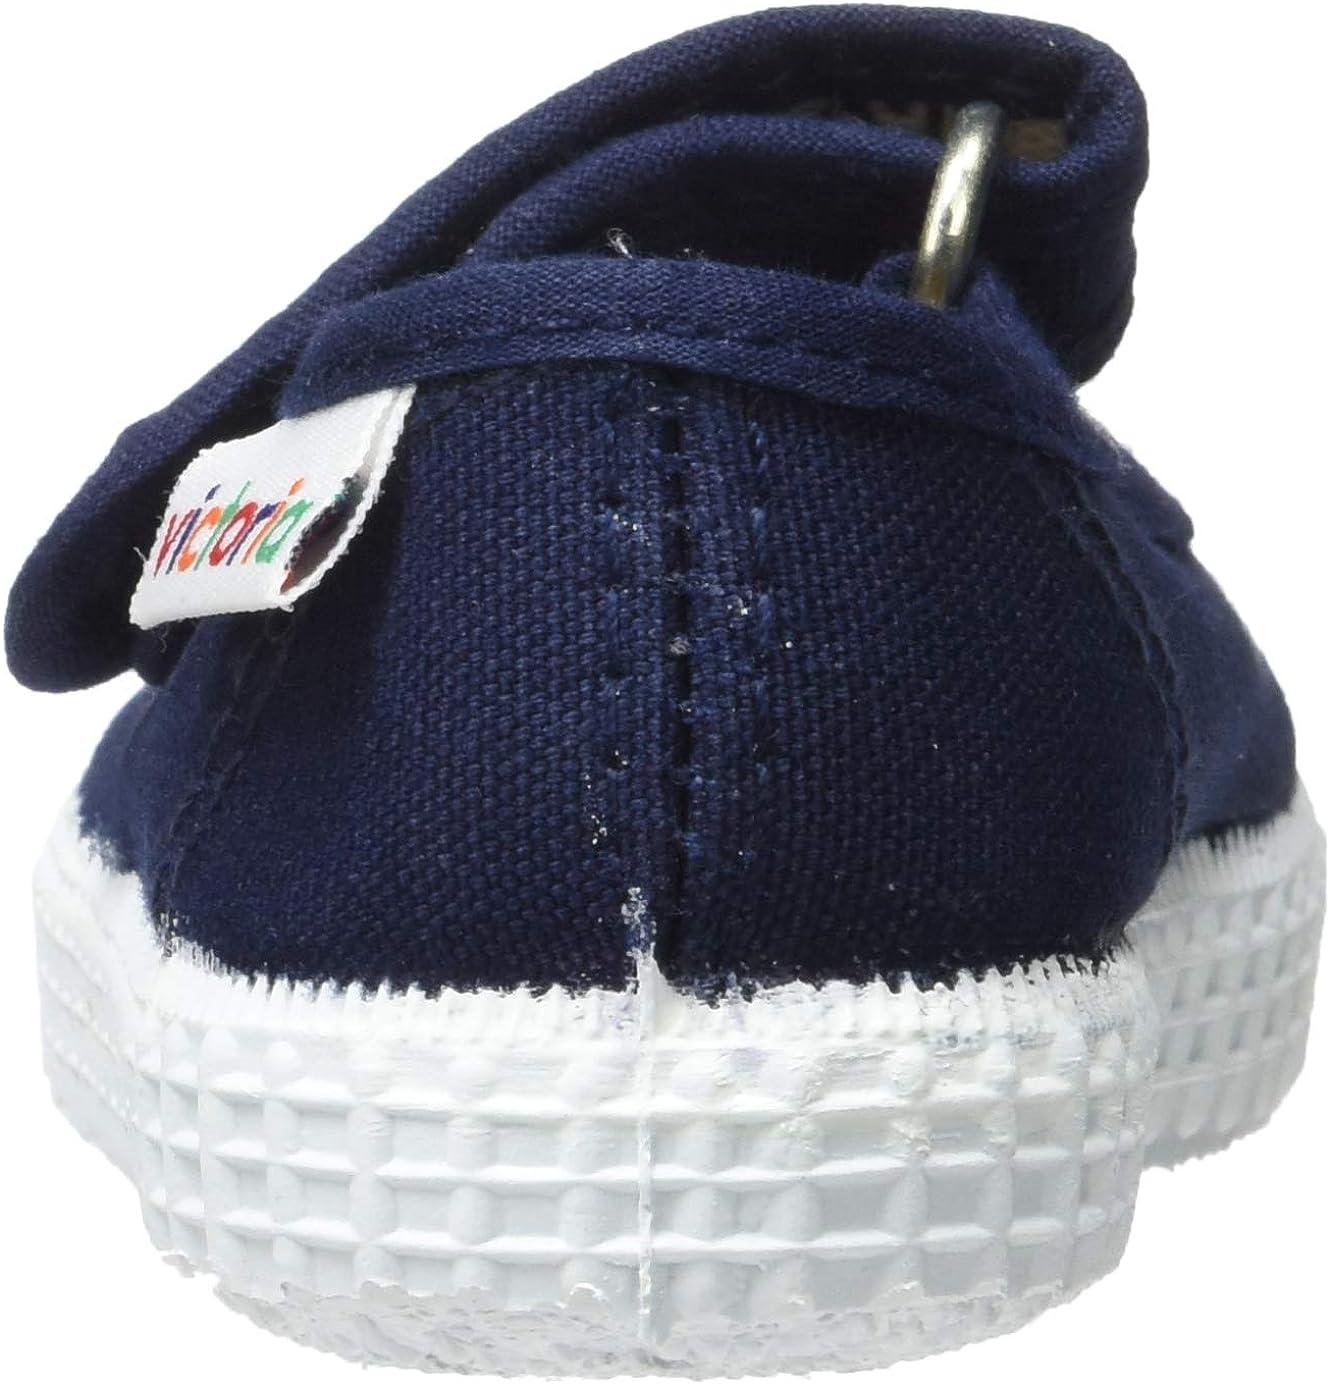 Baskets Fille Victoria 1915 Velcro Lona